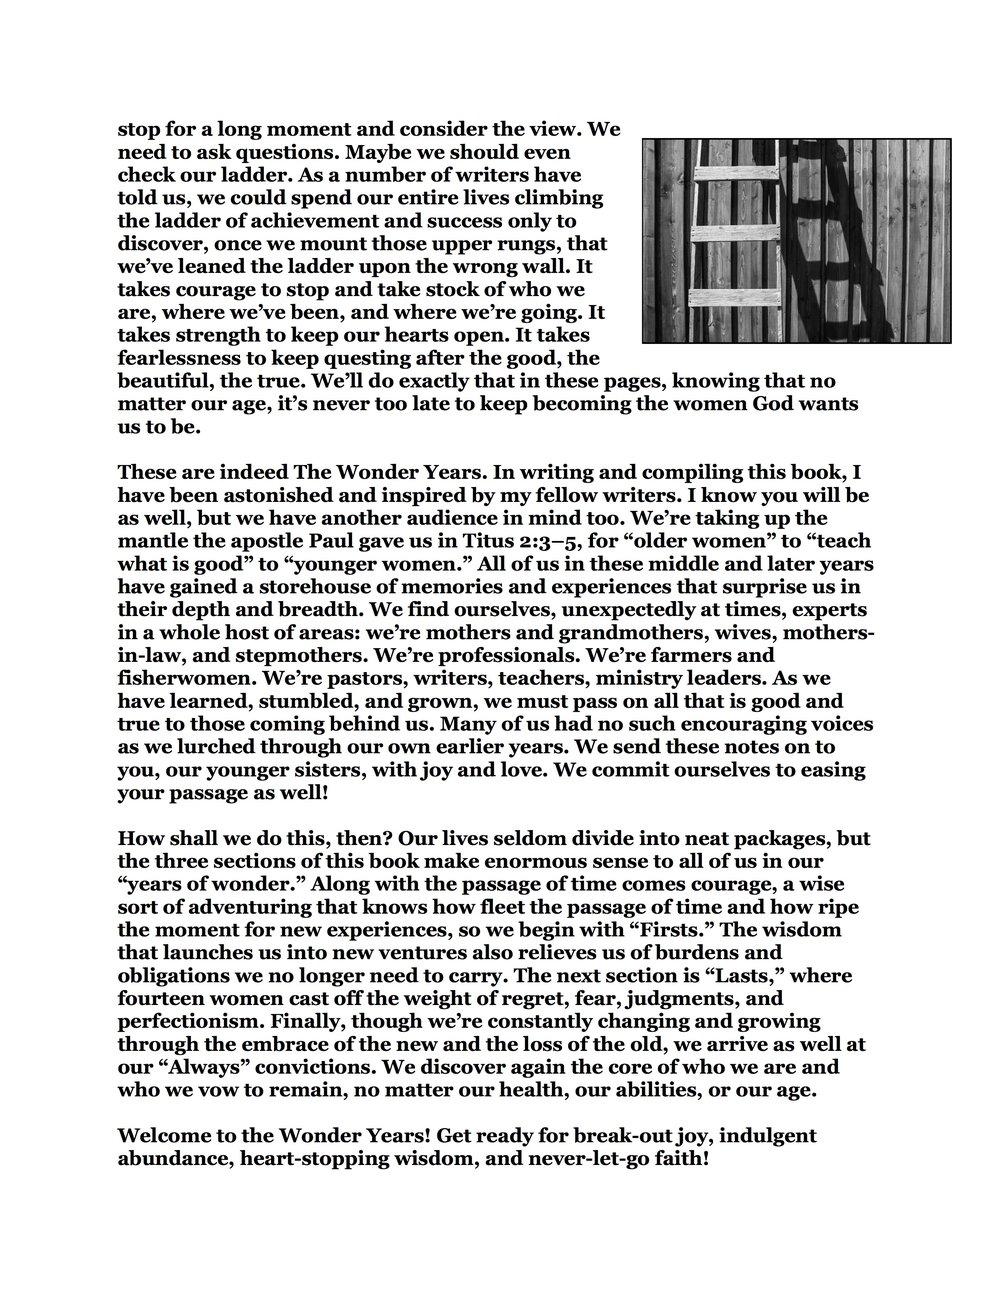 Intro Wonder Years pg 5.jpg